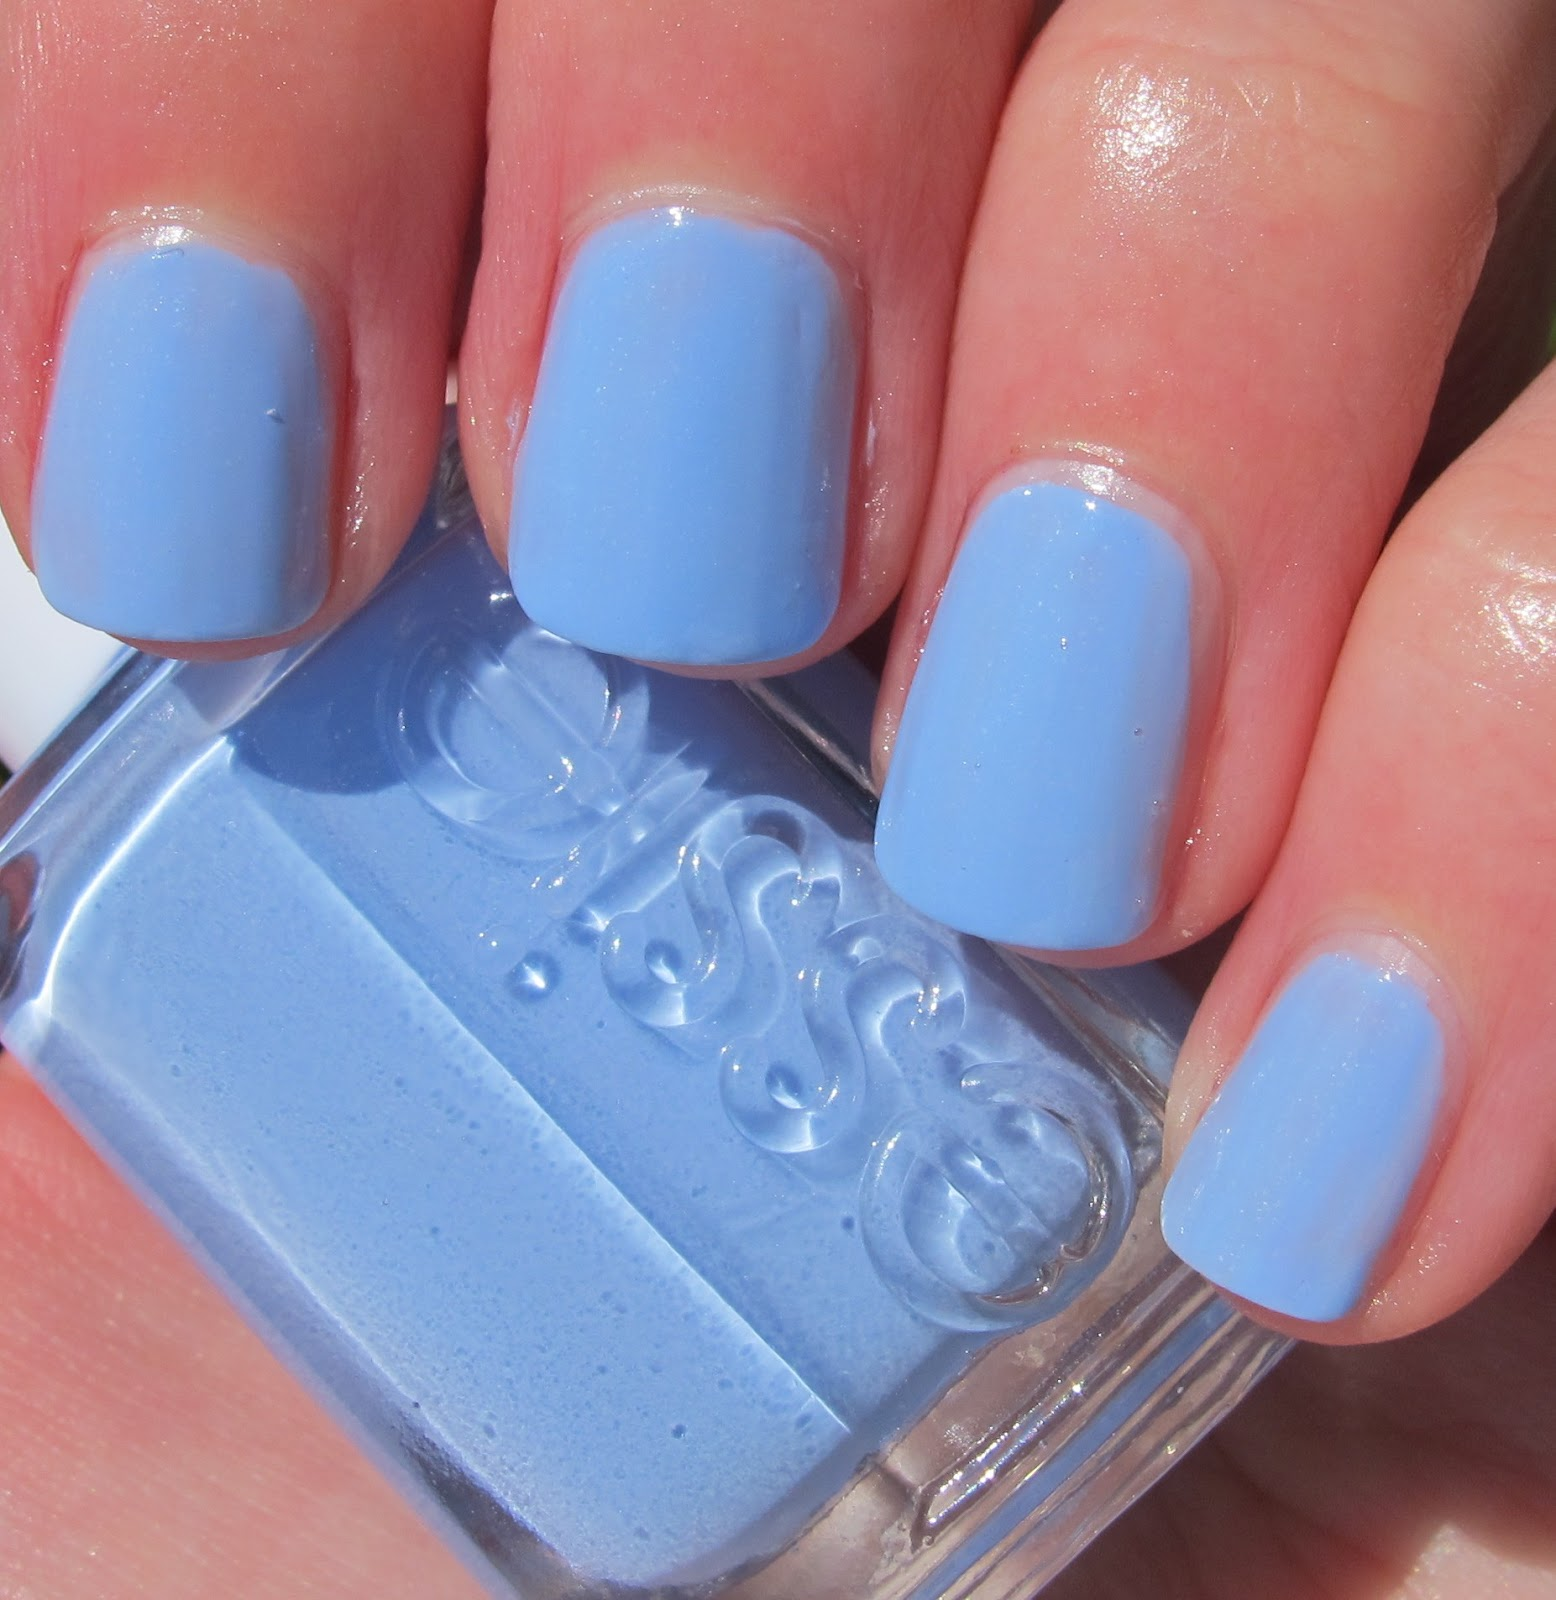 Never Enough Nails: Essie Bikini So Teeny... What\'s In A Name?